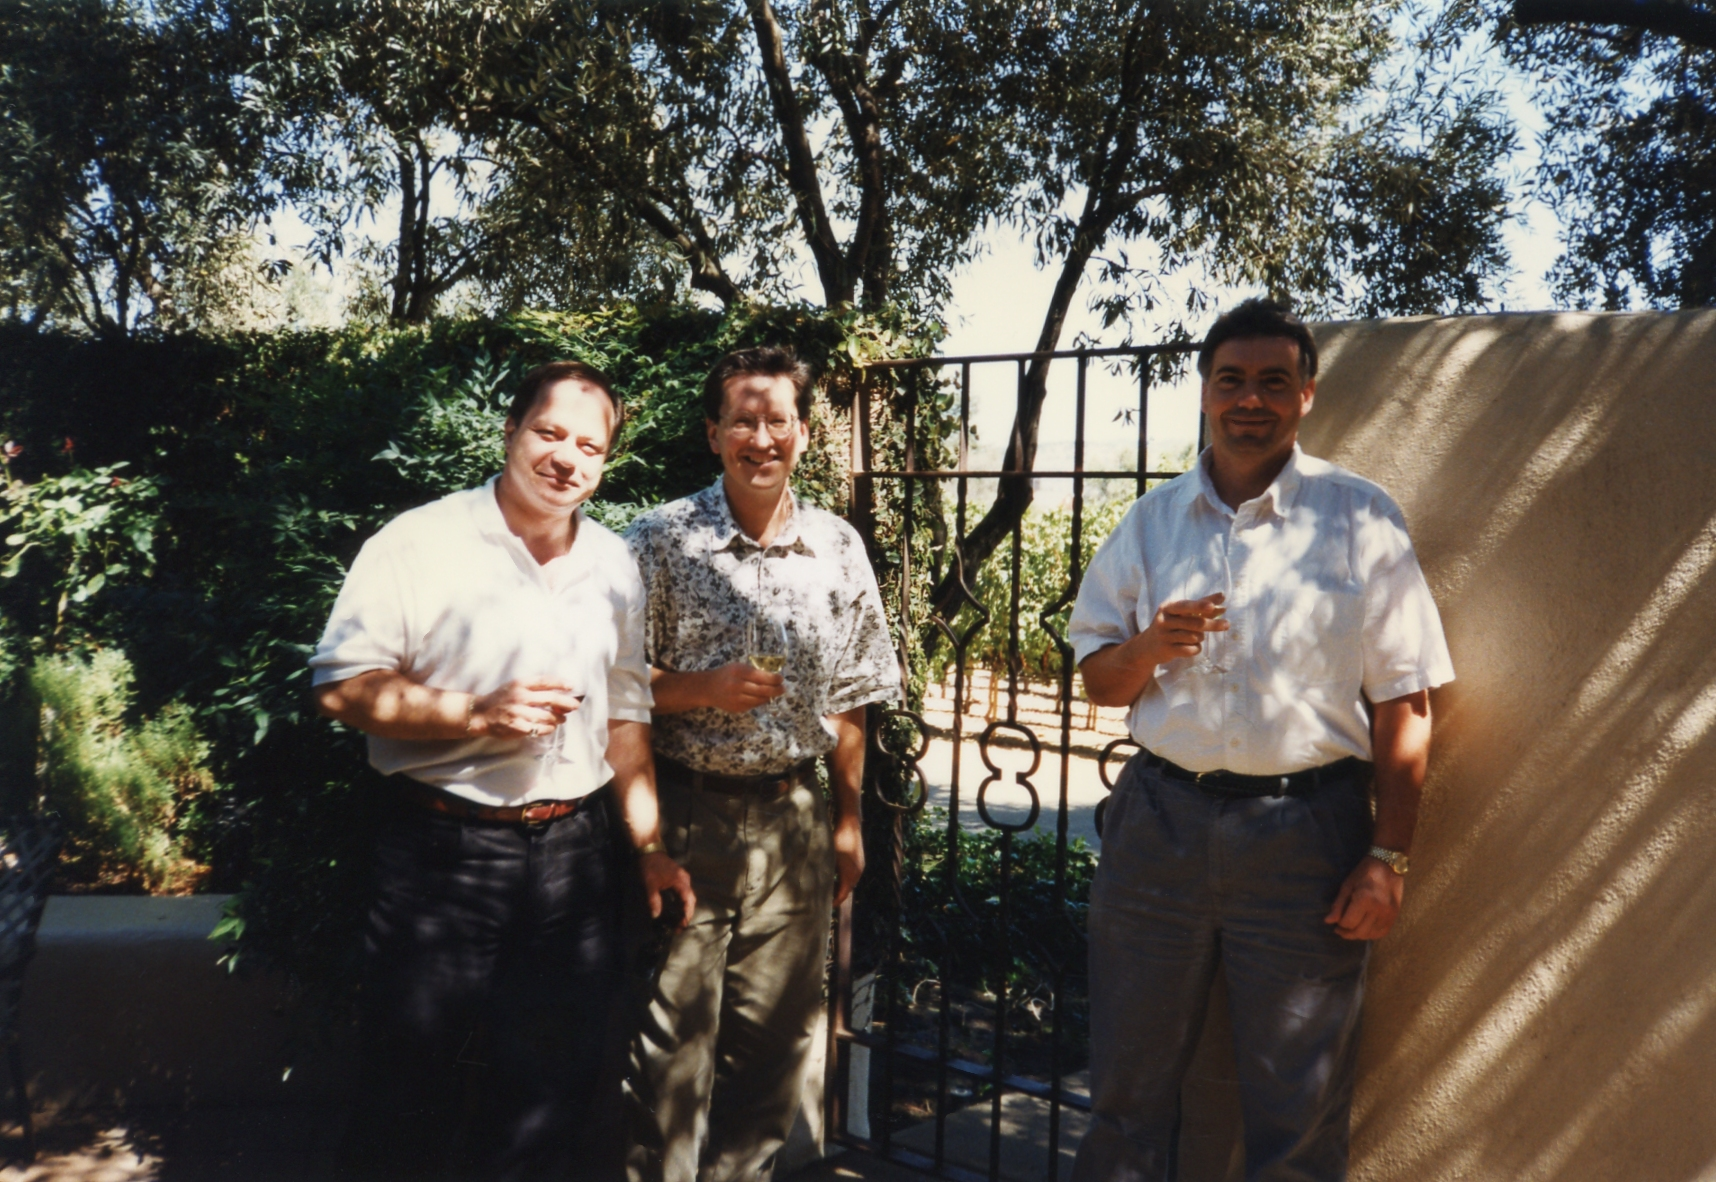 1996-09-07 DAY SAN FRAN (11).jpg